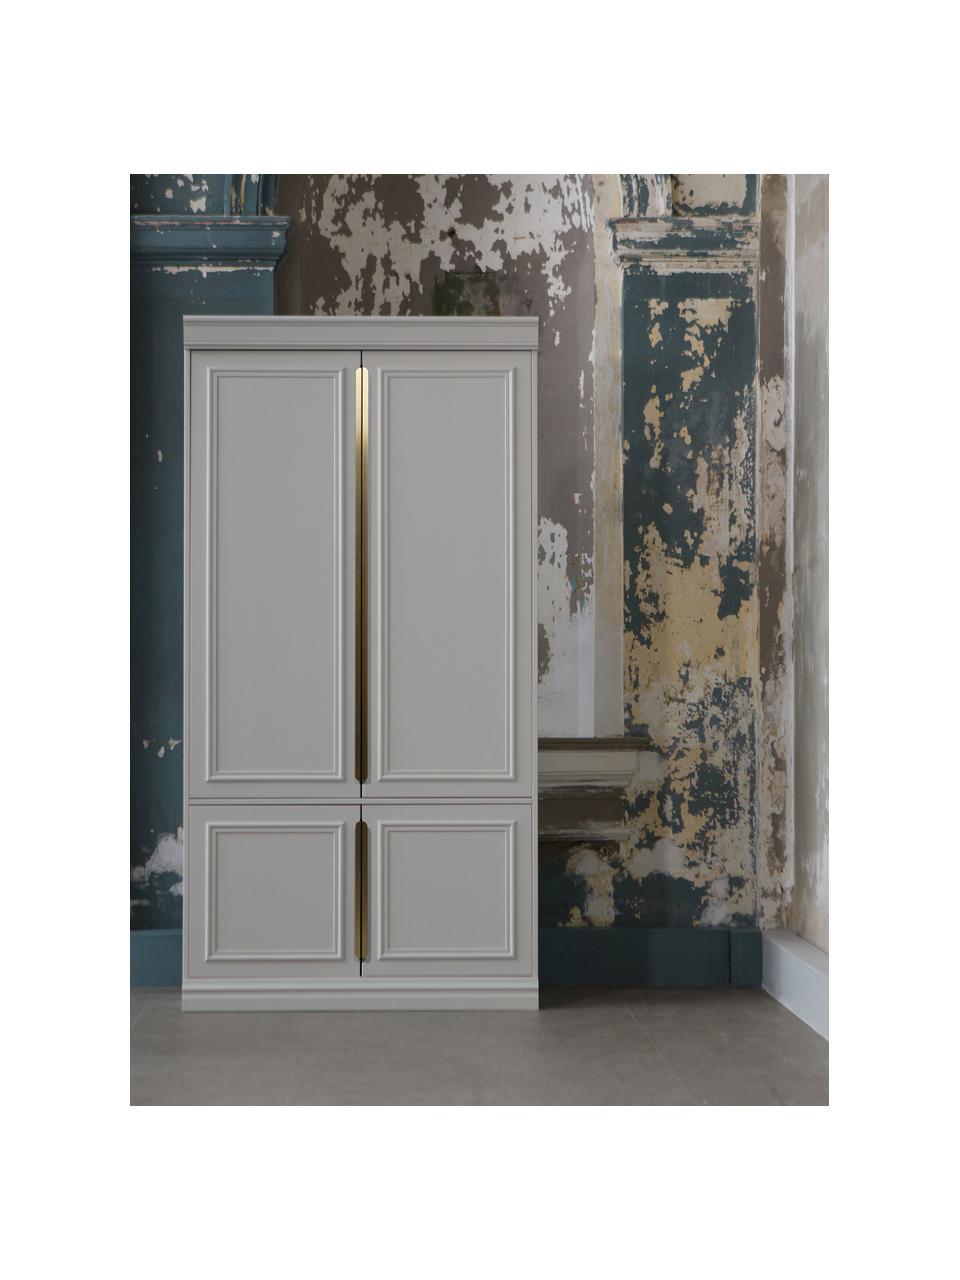 Armadio classico Organize, Maniglie: metallo rivestito, Grigio, bianco, Larg. 110 x Alt. 215 cm